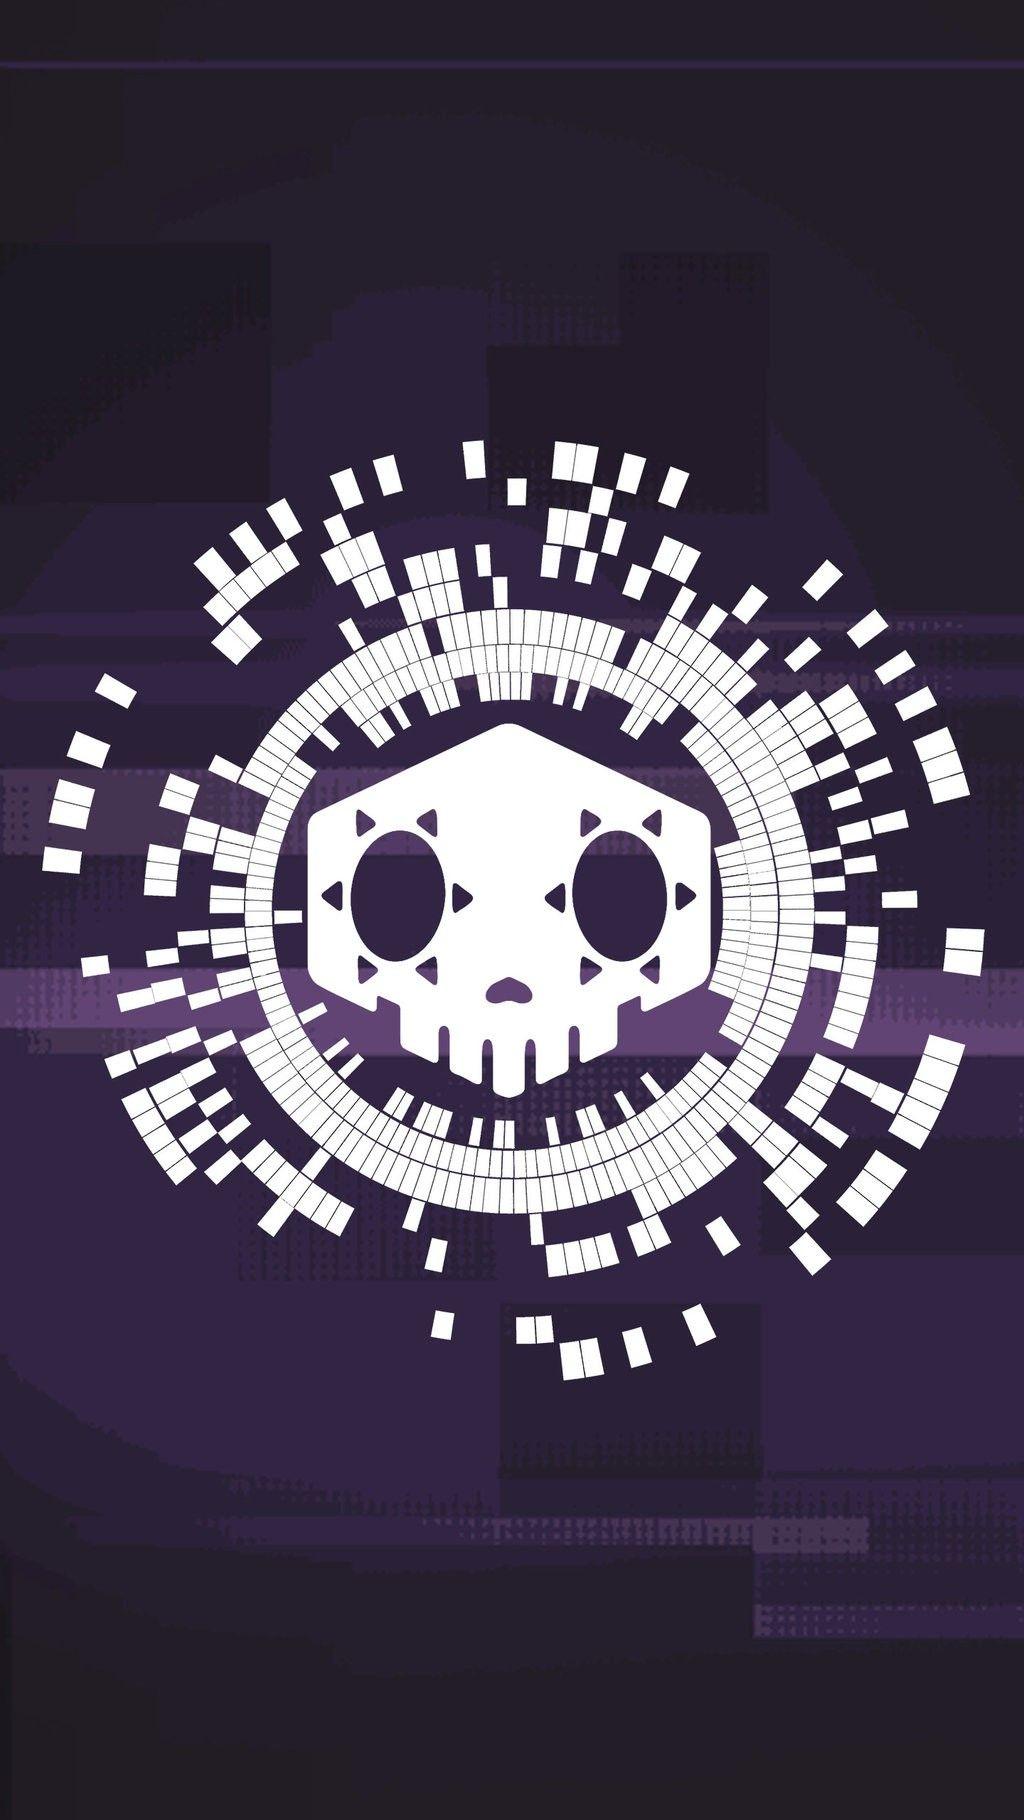 Sombra Logo Overwatch Papel De Parede Para Telefone Ilustracoes Planos De Fundo